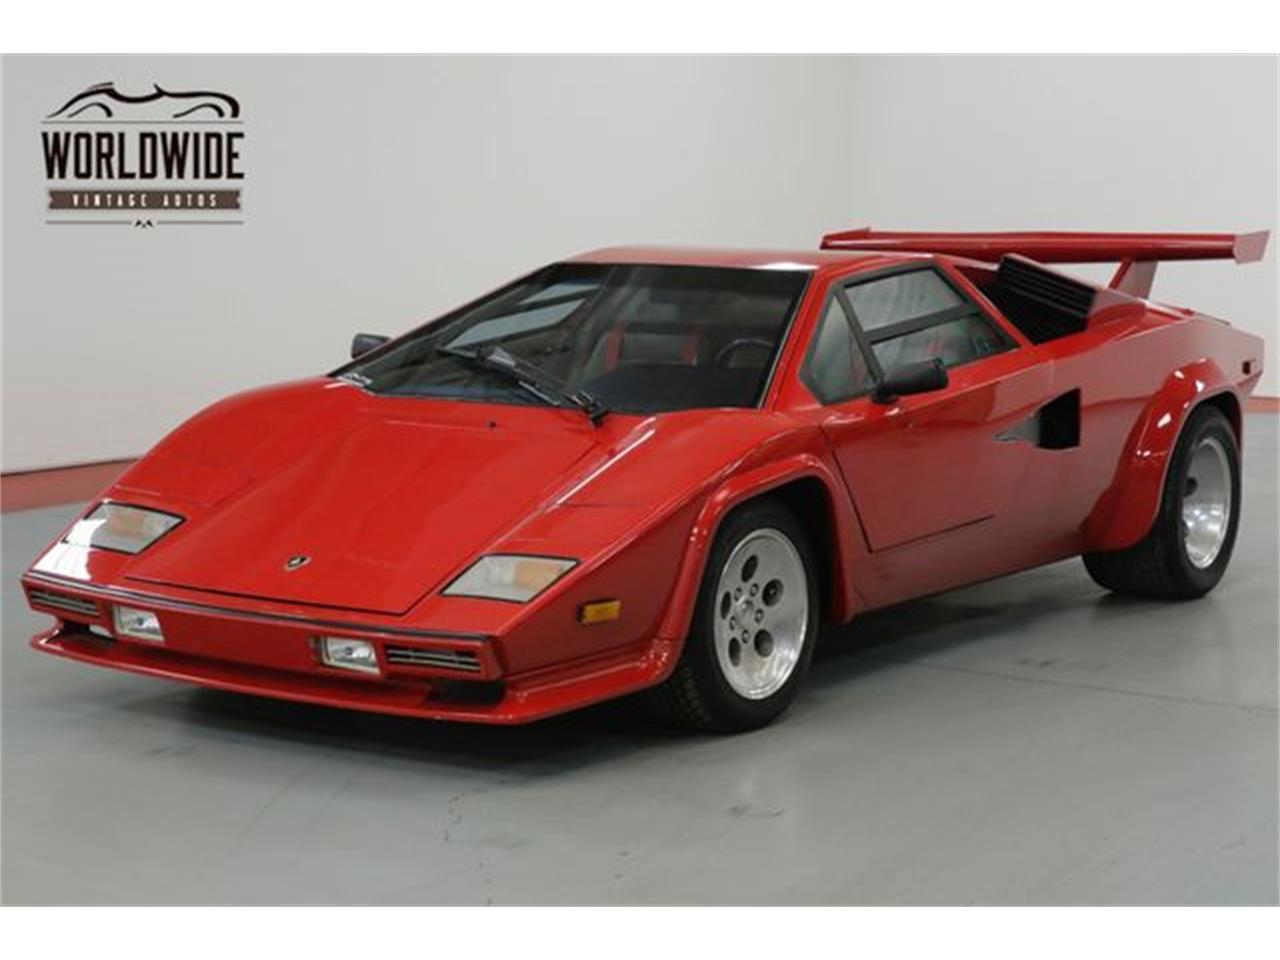 1990 Lamborghini Countach For Sale Classiccars Com Cc 1174730